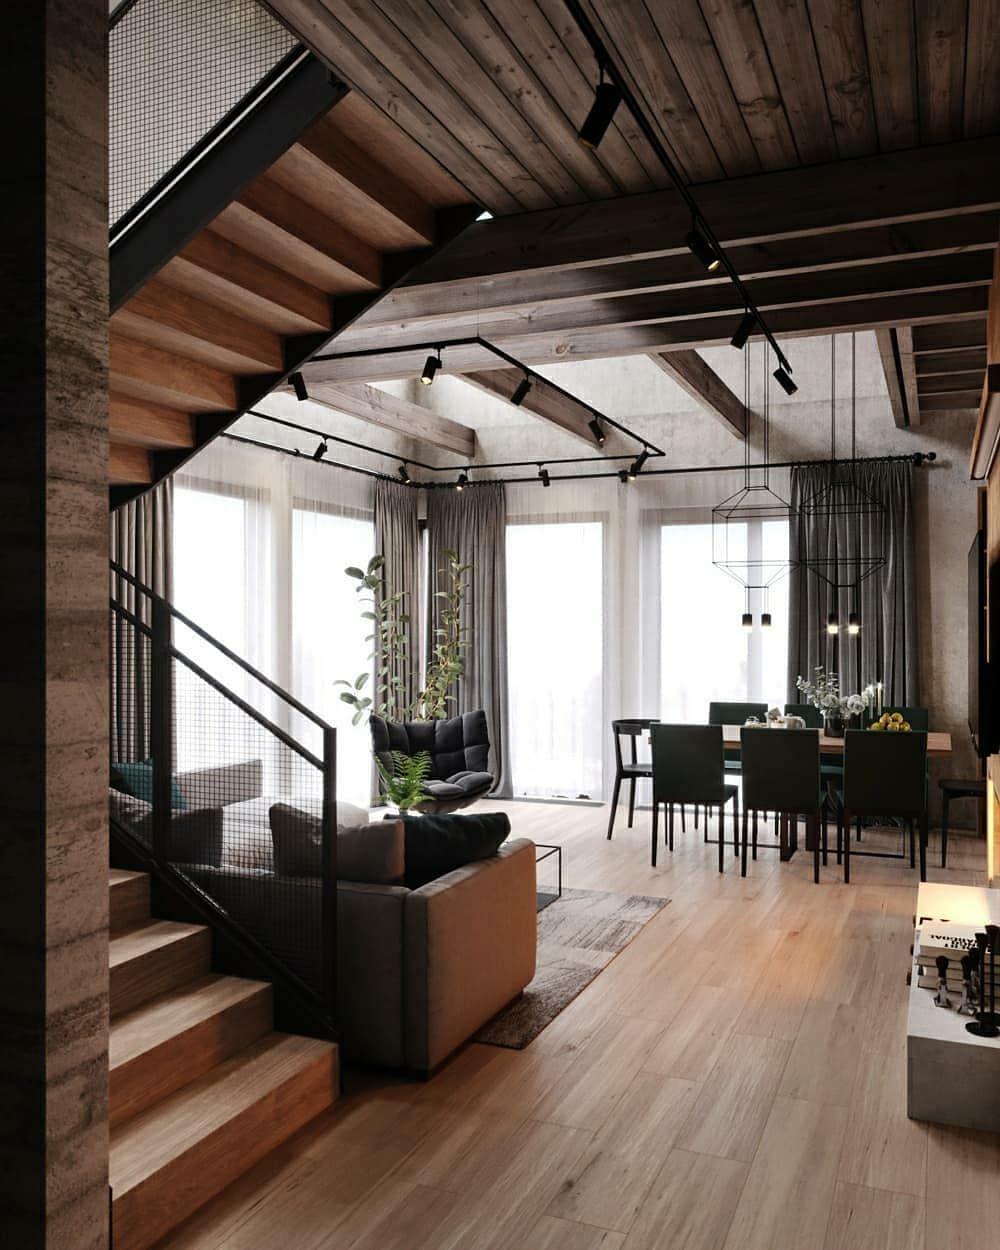 Cheap Loft Apartments: Pin By Ruslana Berest On Дизайн квартиры